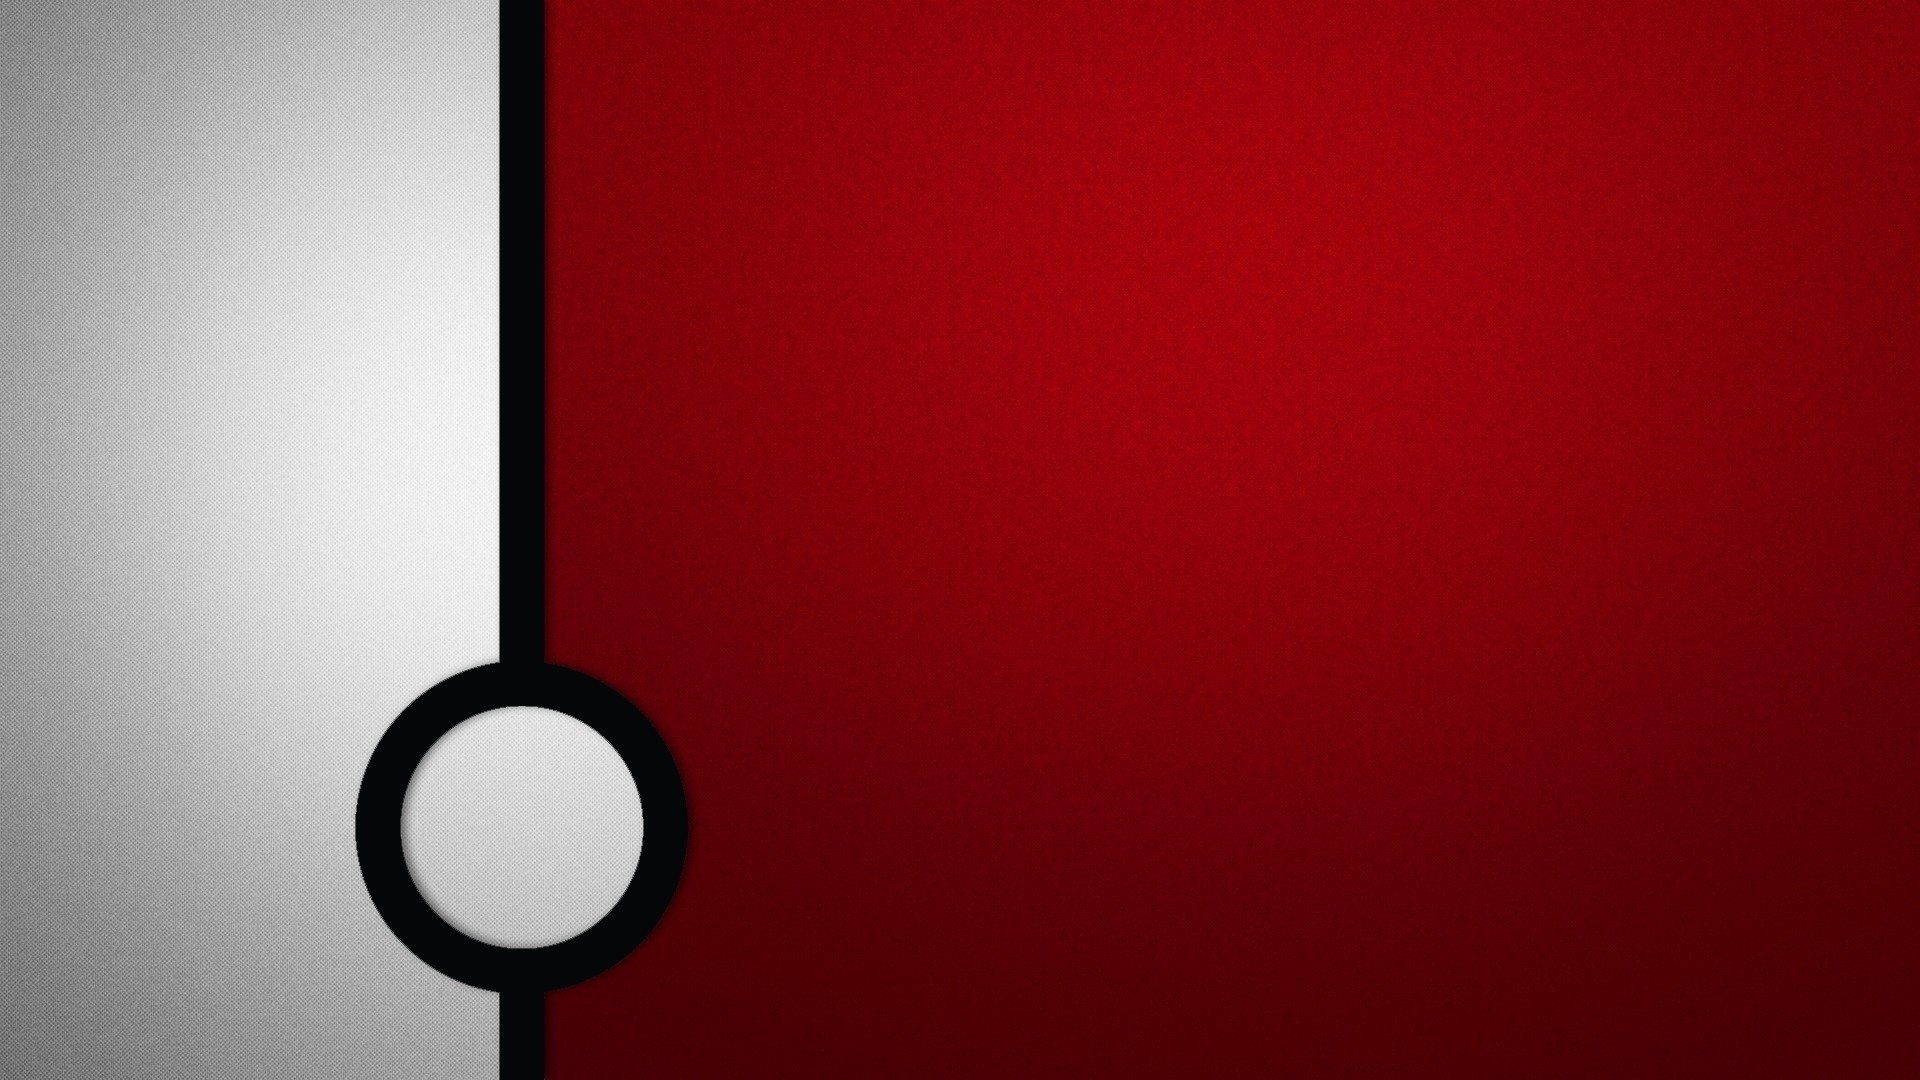 pokemon pokemon simple design 1920x1080 wallpaper 1920x1080